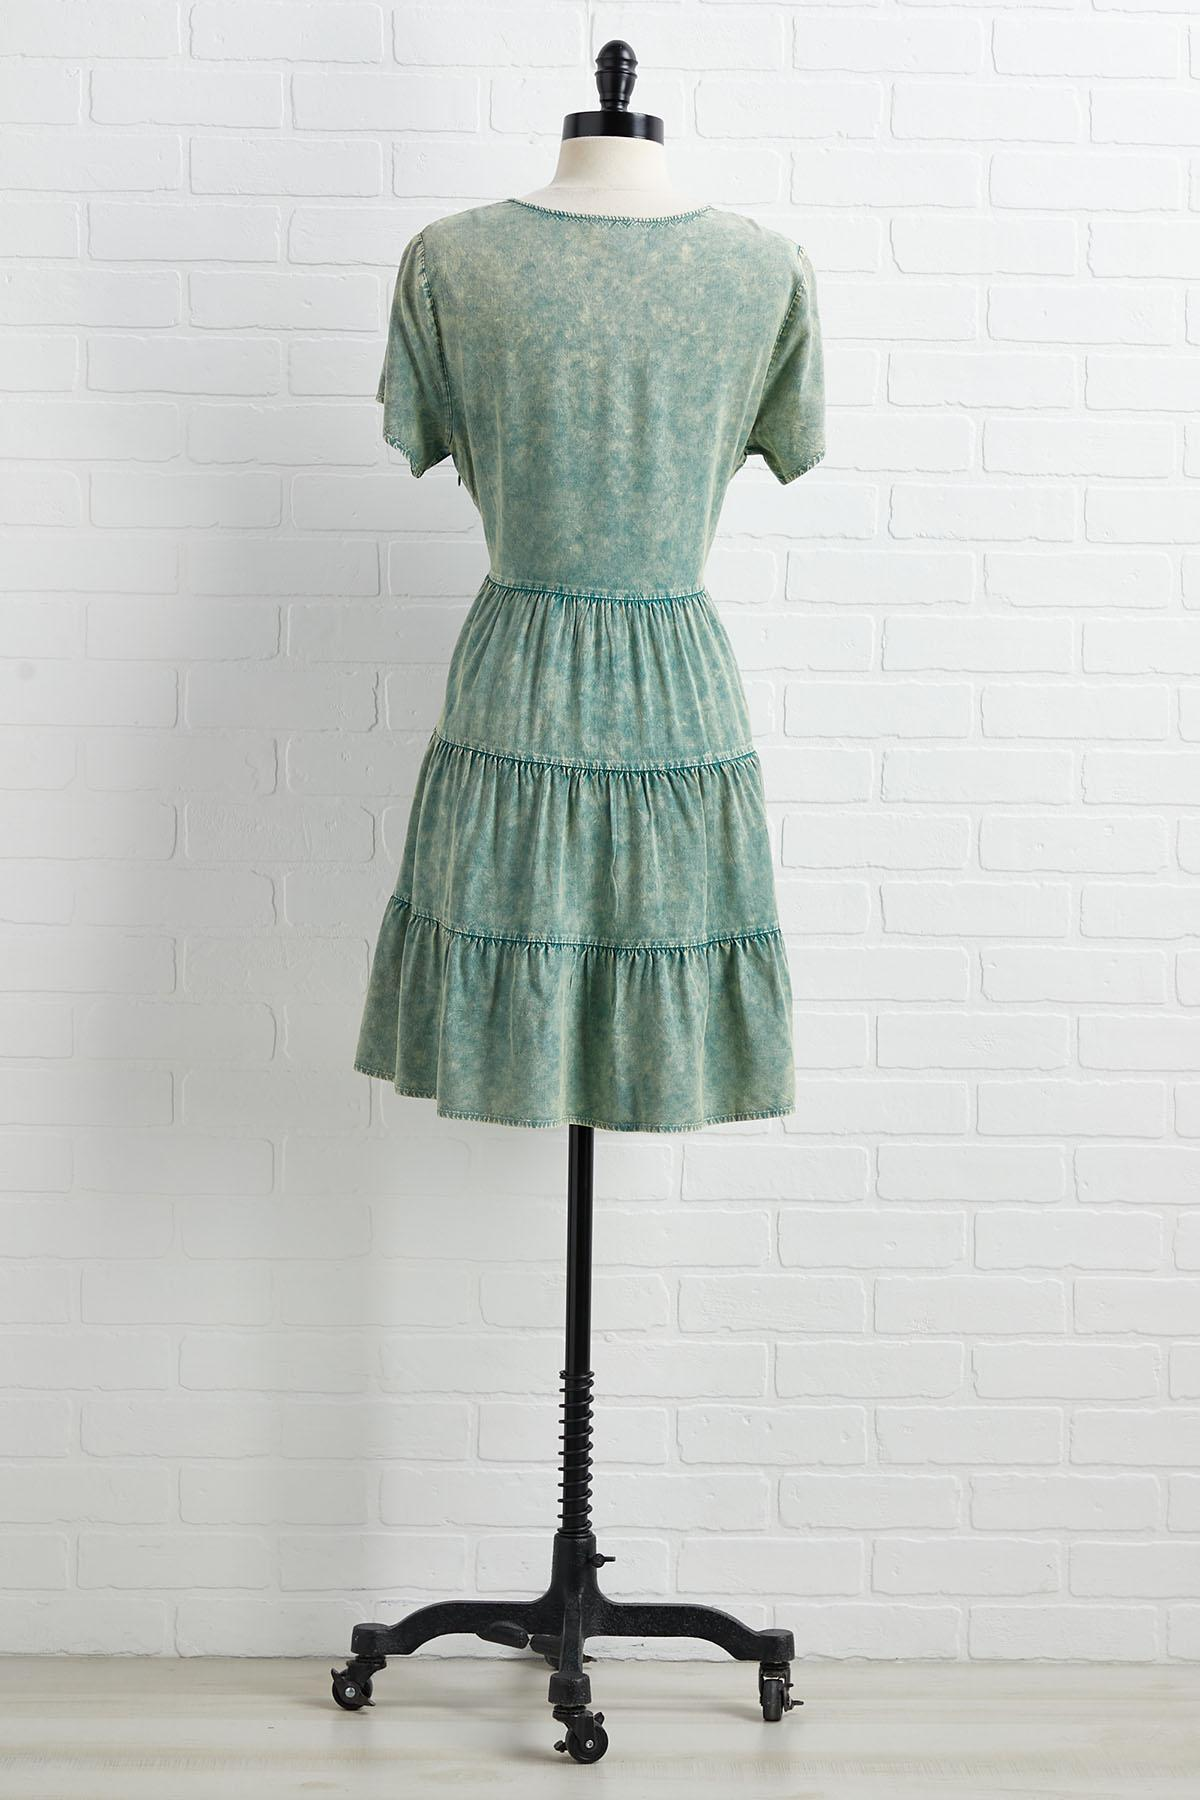 Mineral Wash Your Back Dress